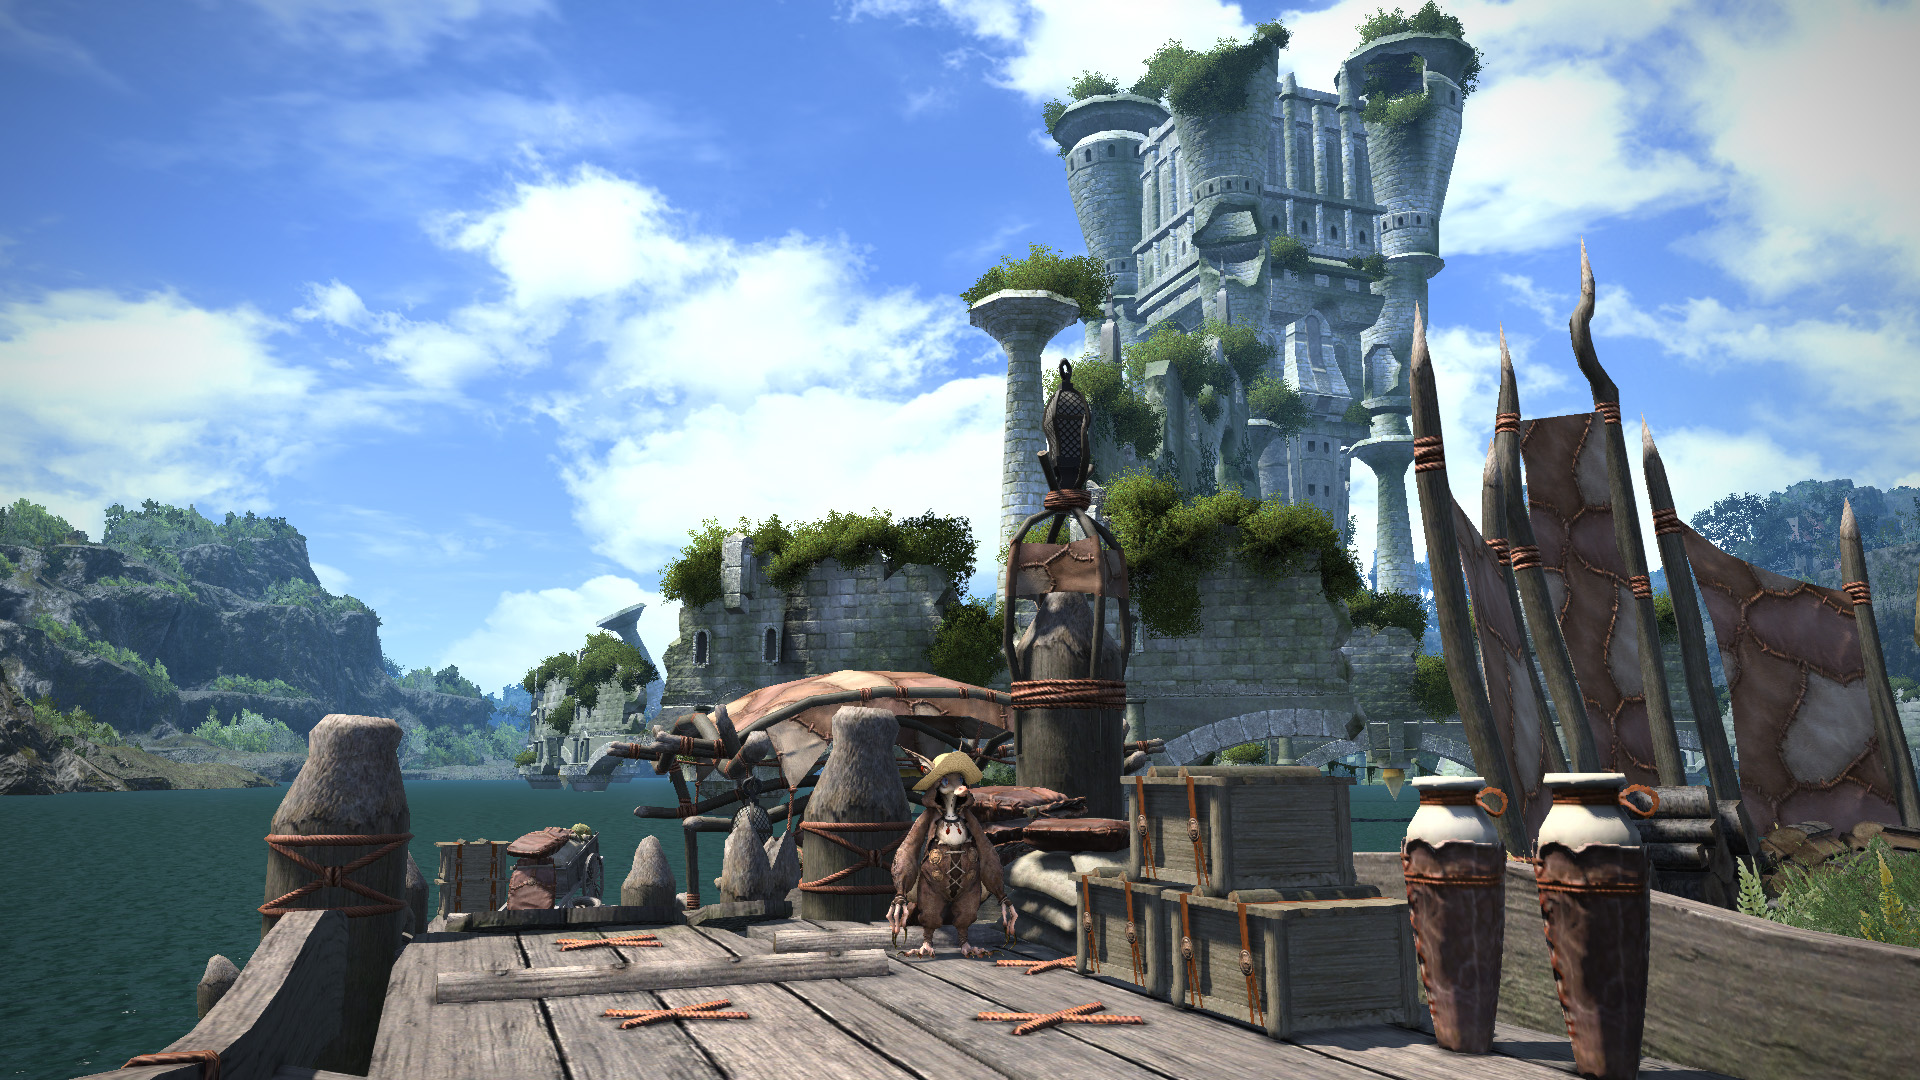 Final Fantasy XIV No Hud | Nohud Wiki | FANDOM powered by Wikia